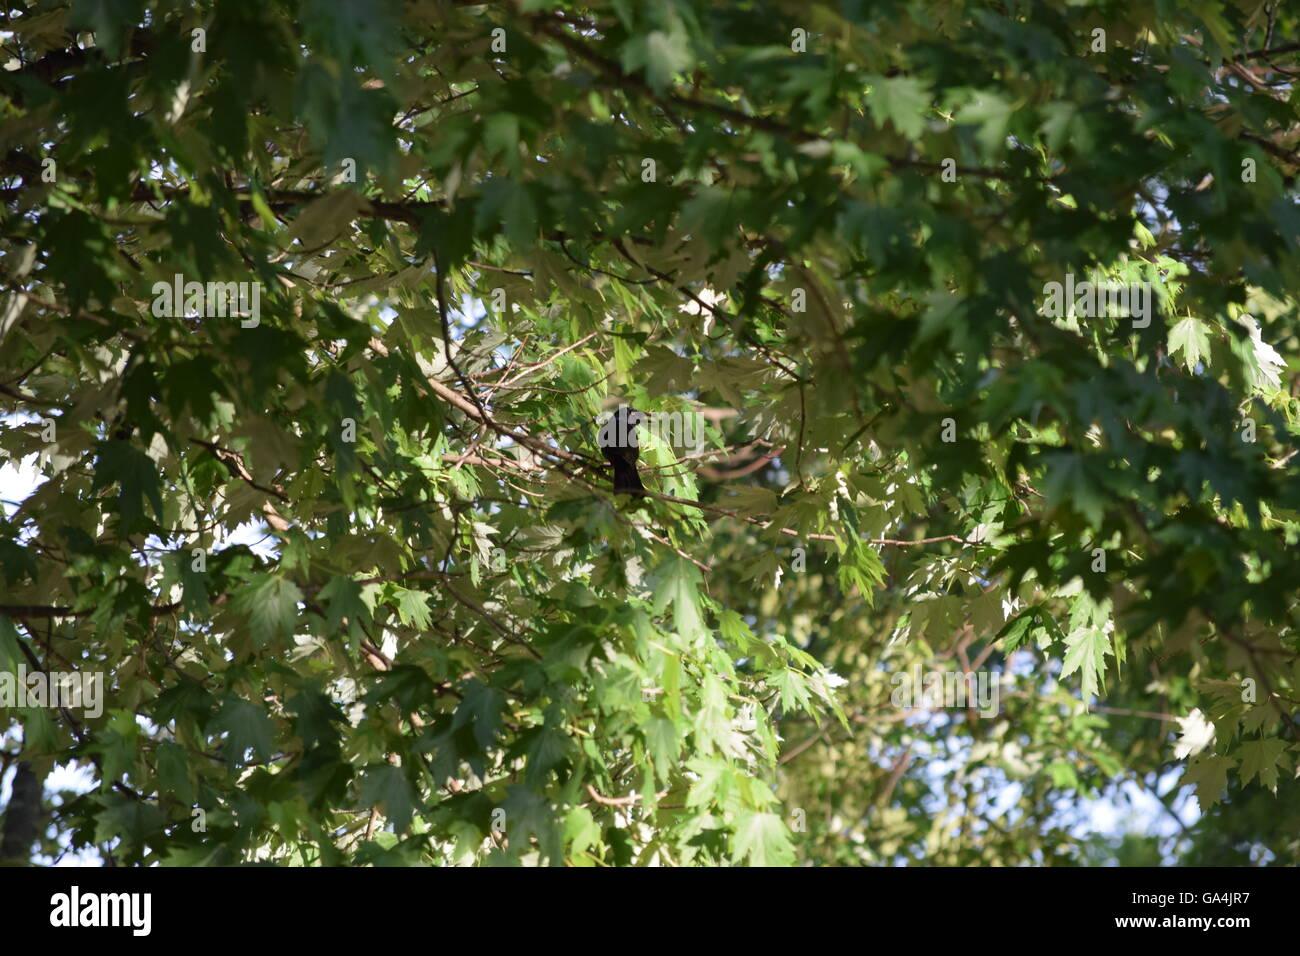 Black bird in a tree - Stock Image